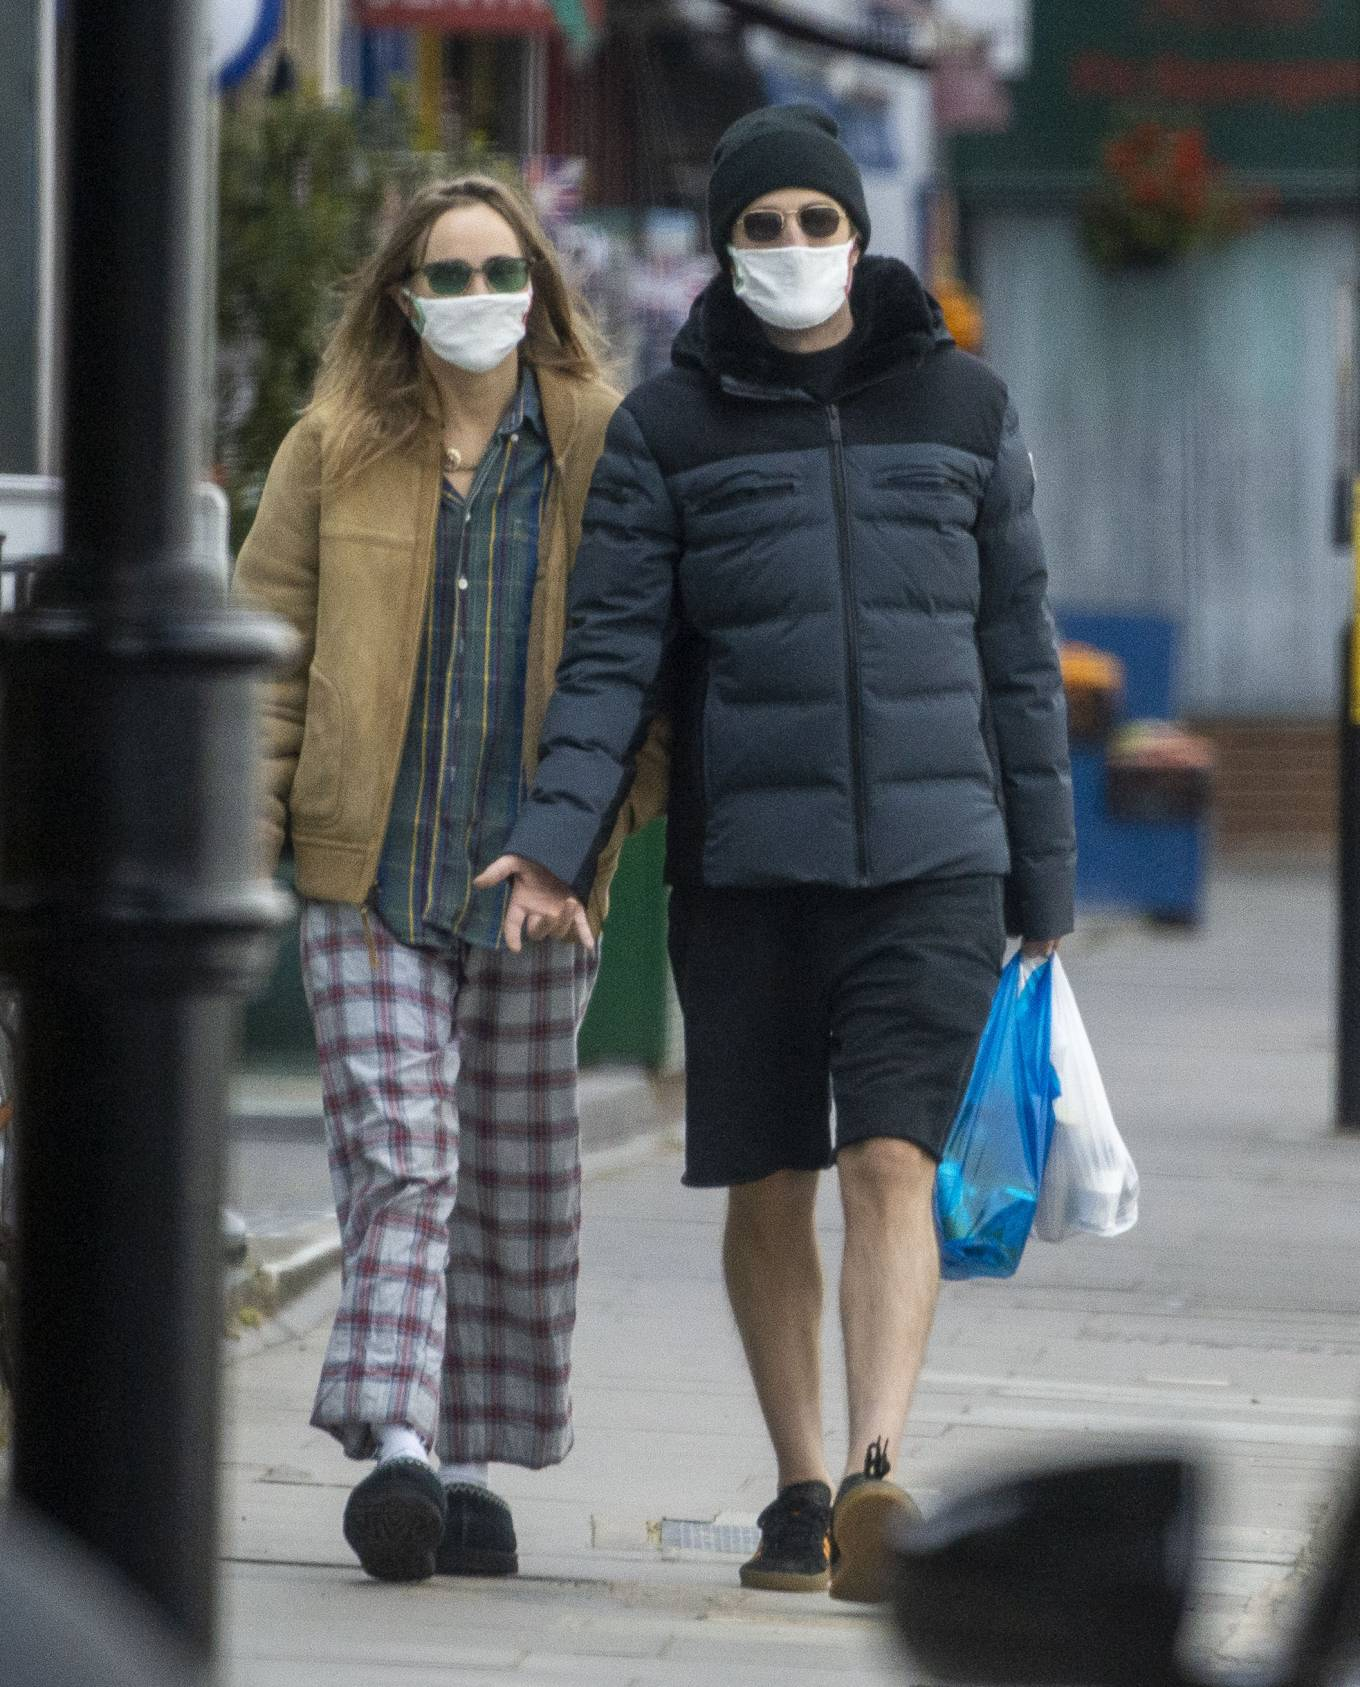 Suki Waterhouse 2020 : Suki Waterhouse and Robert Pattinson – Wearing matching face masks in London-01